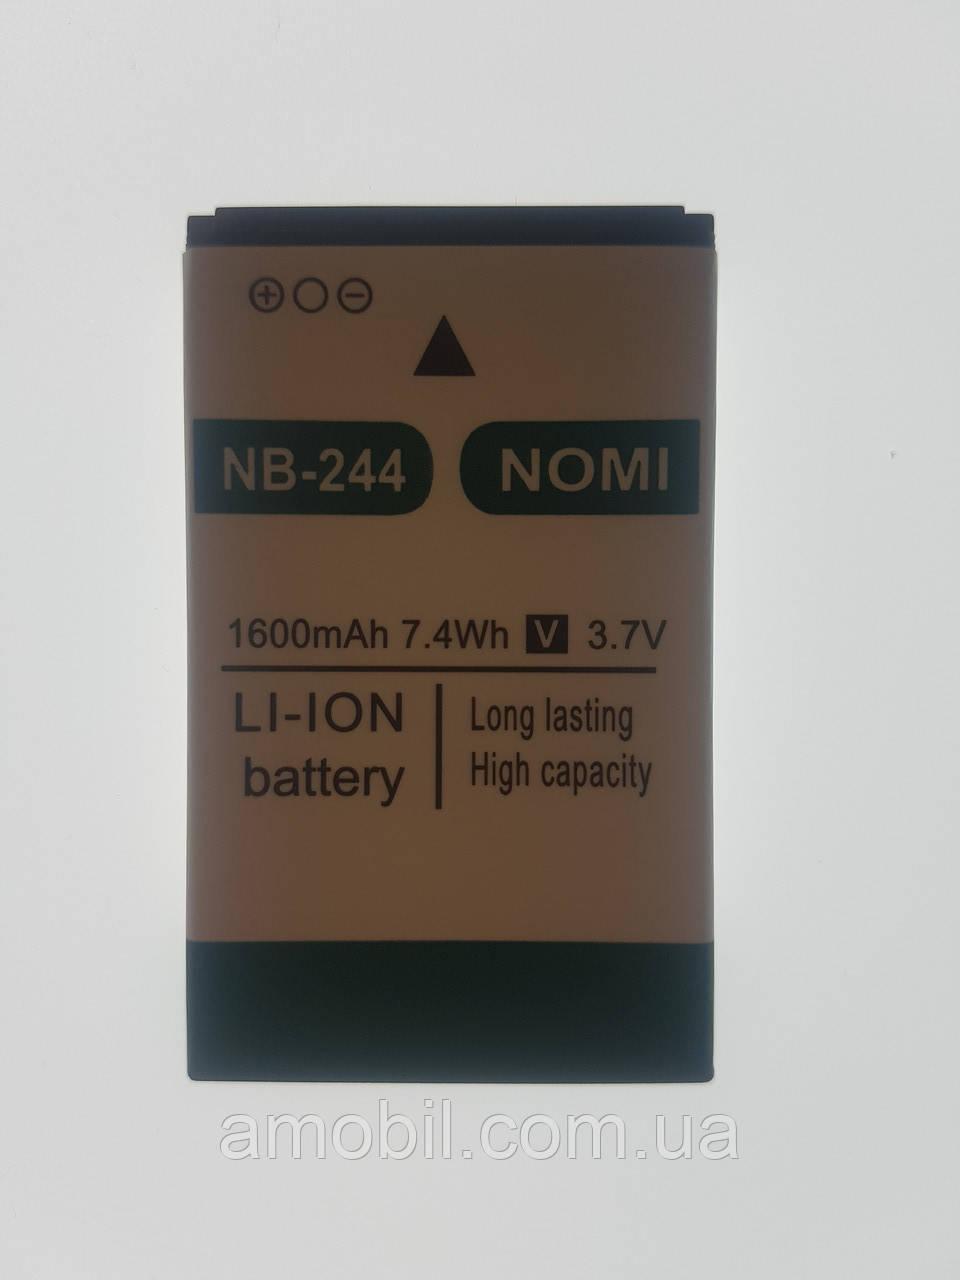 Аккумулятор Nomi i244 NB-244 (1600 mAh)